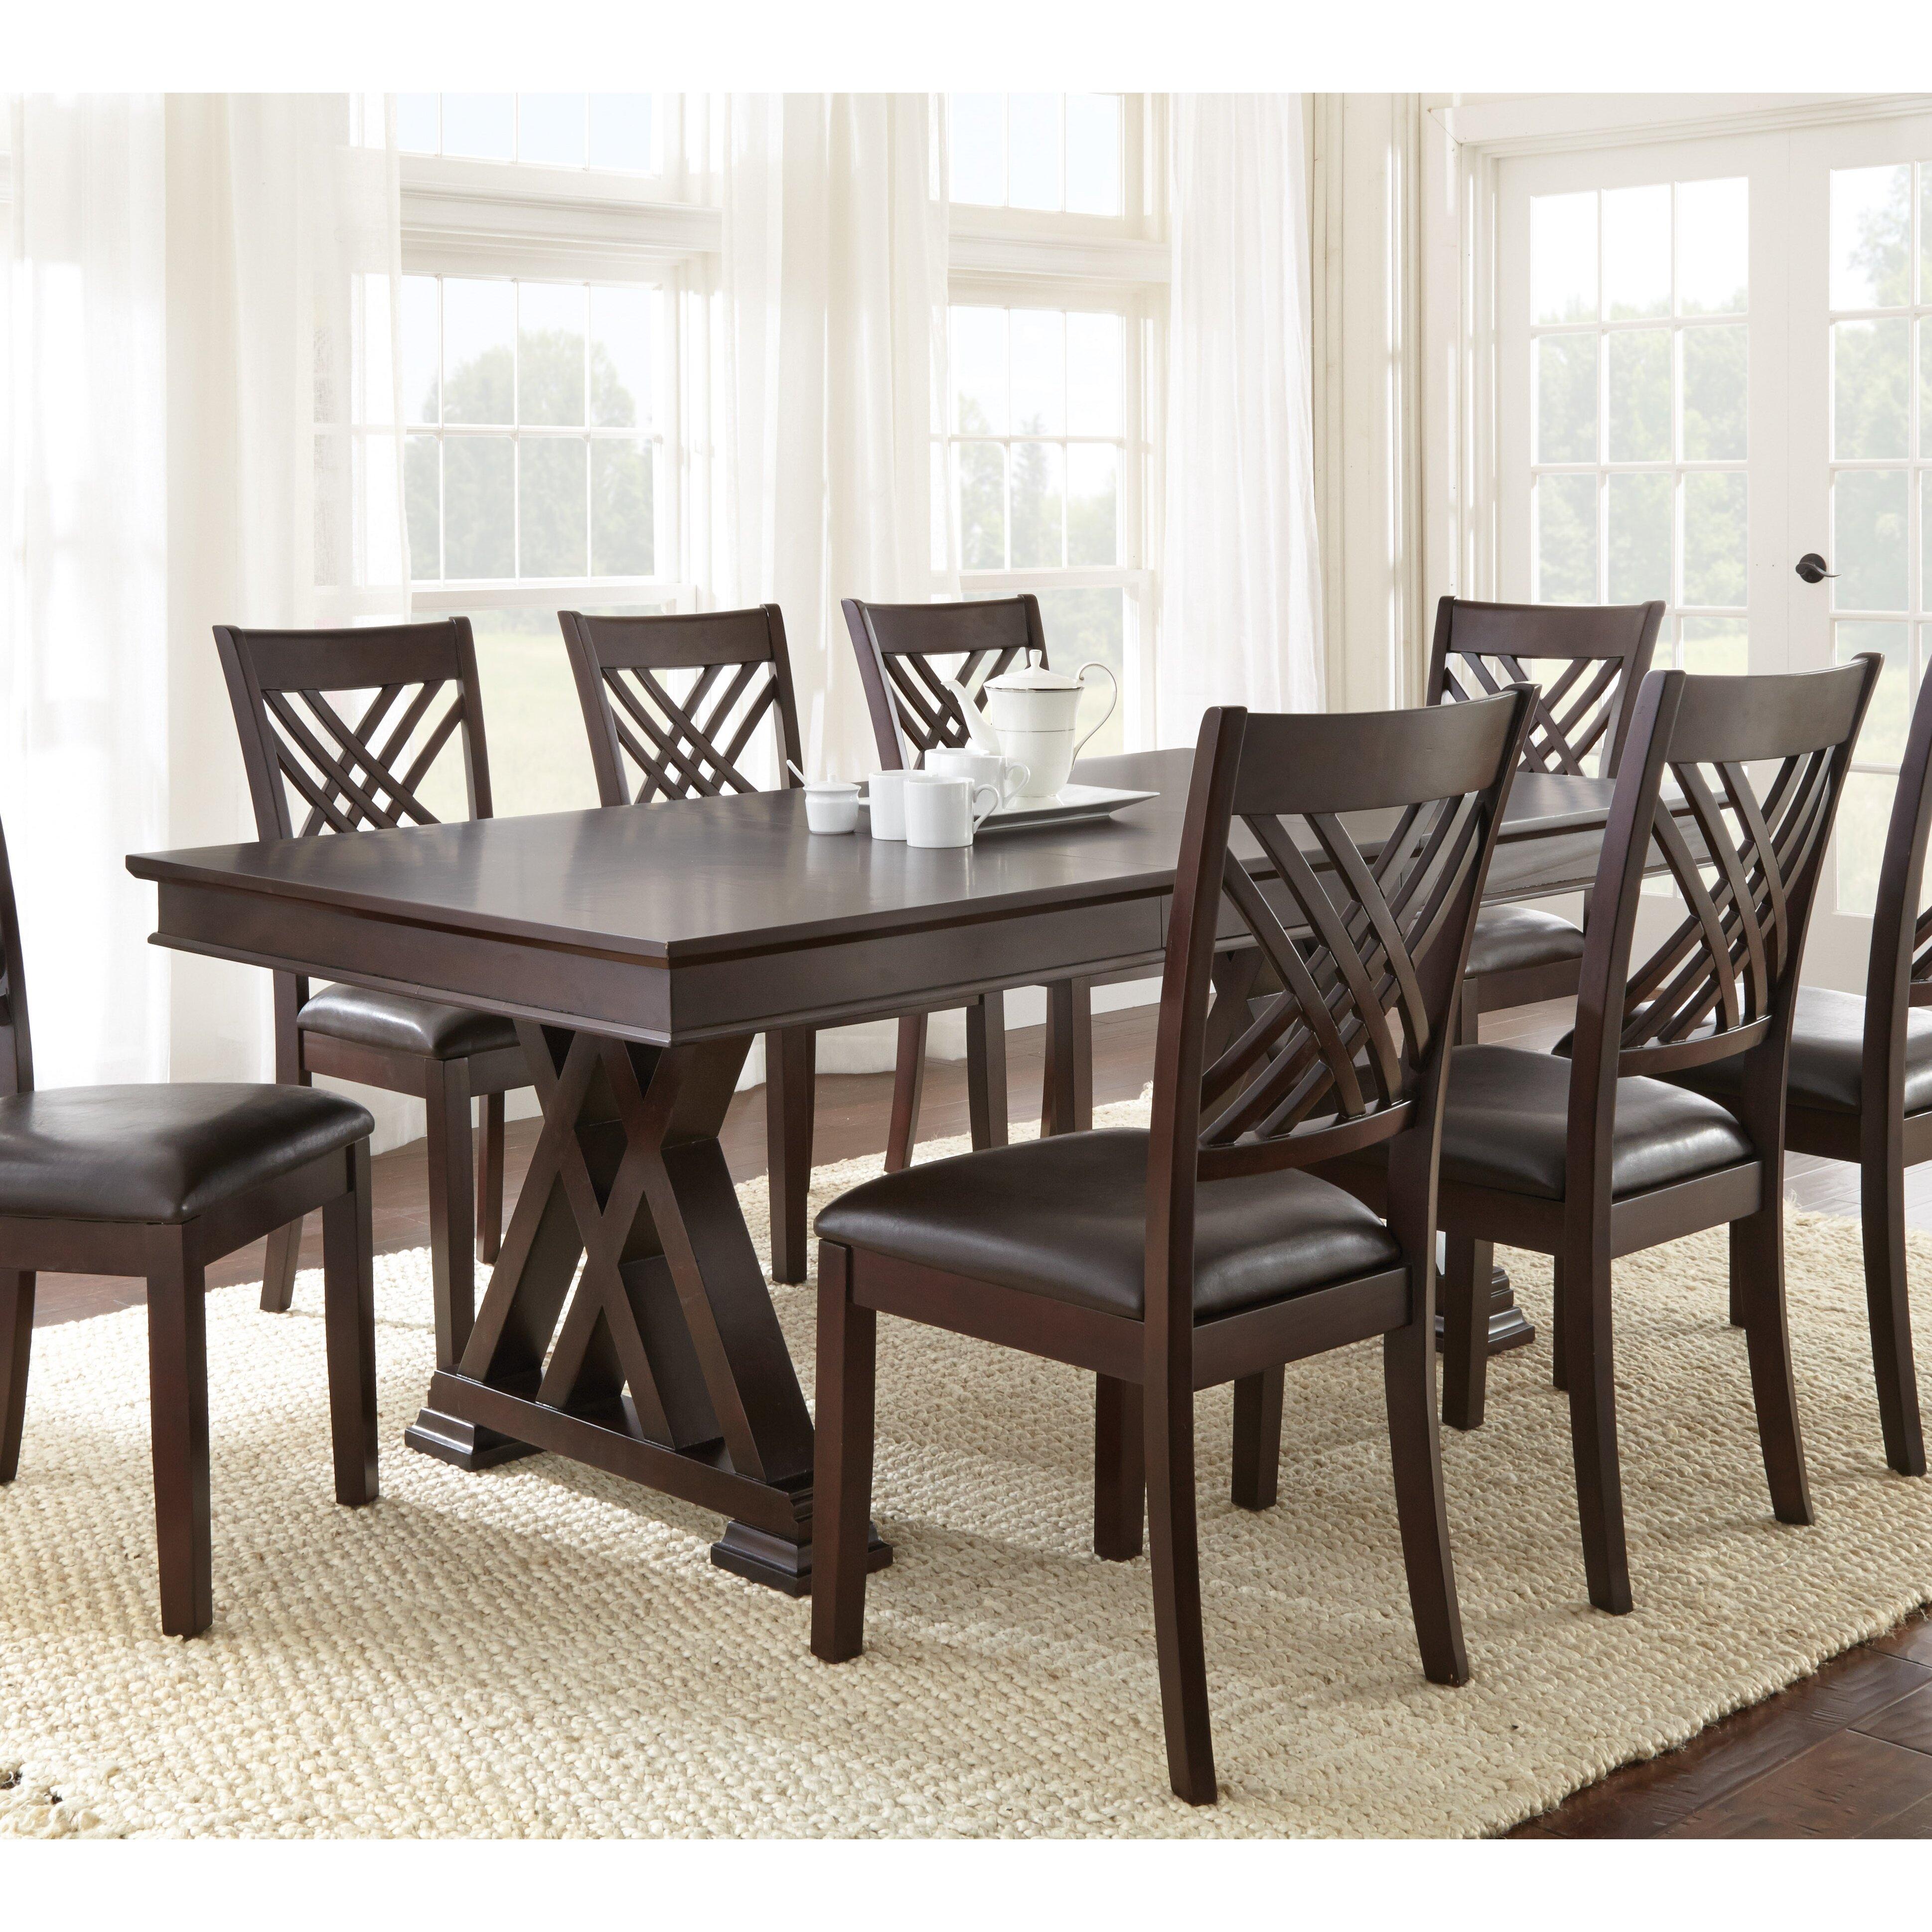 9 piece dining room sets | Adrian 9 Piece Dining Set | Wayfair